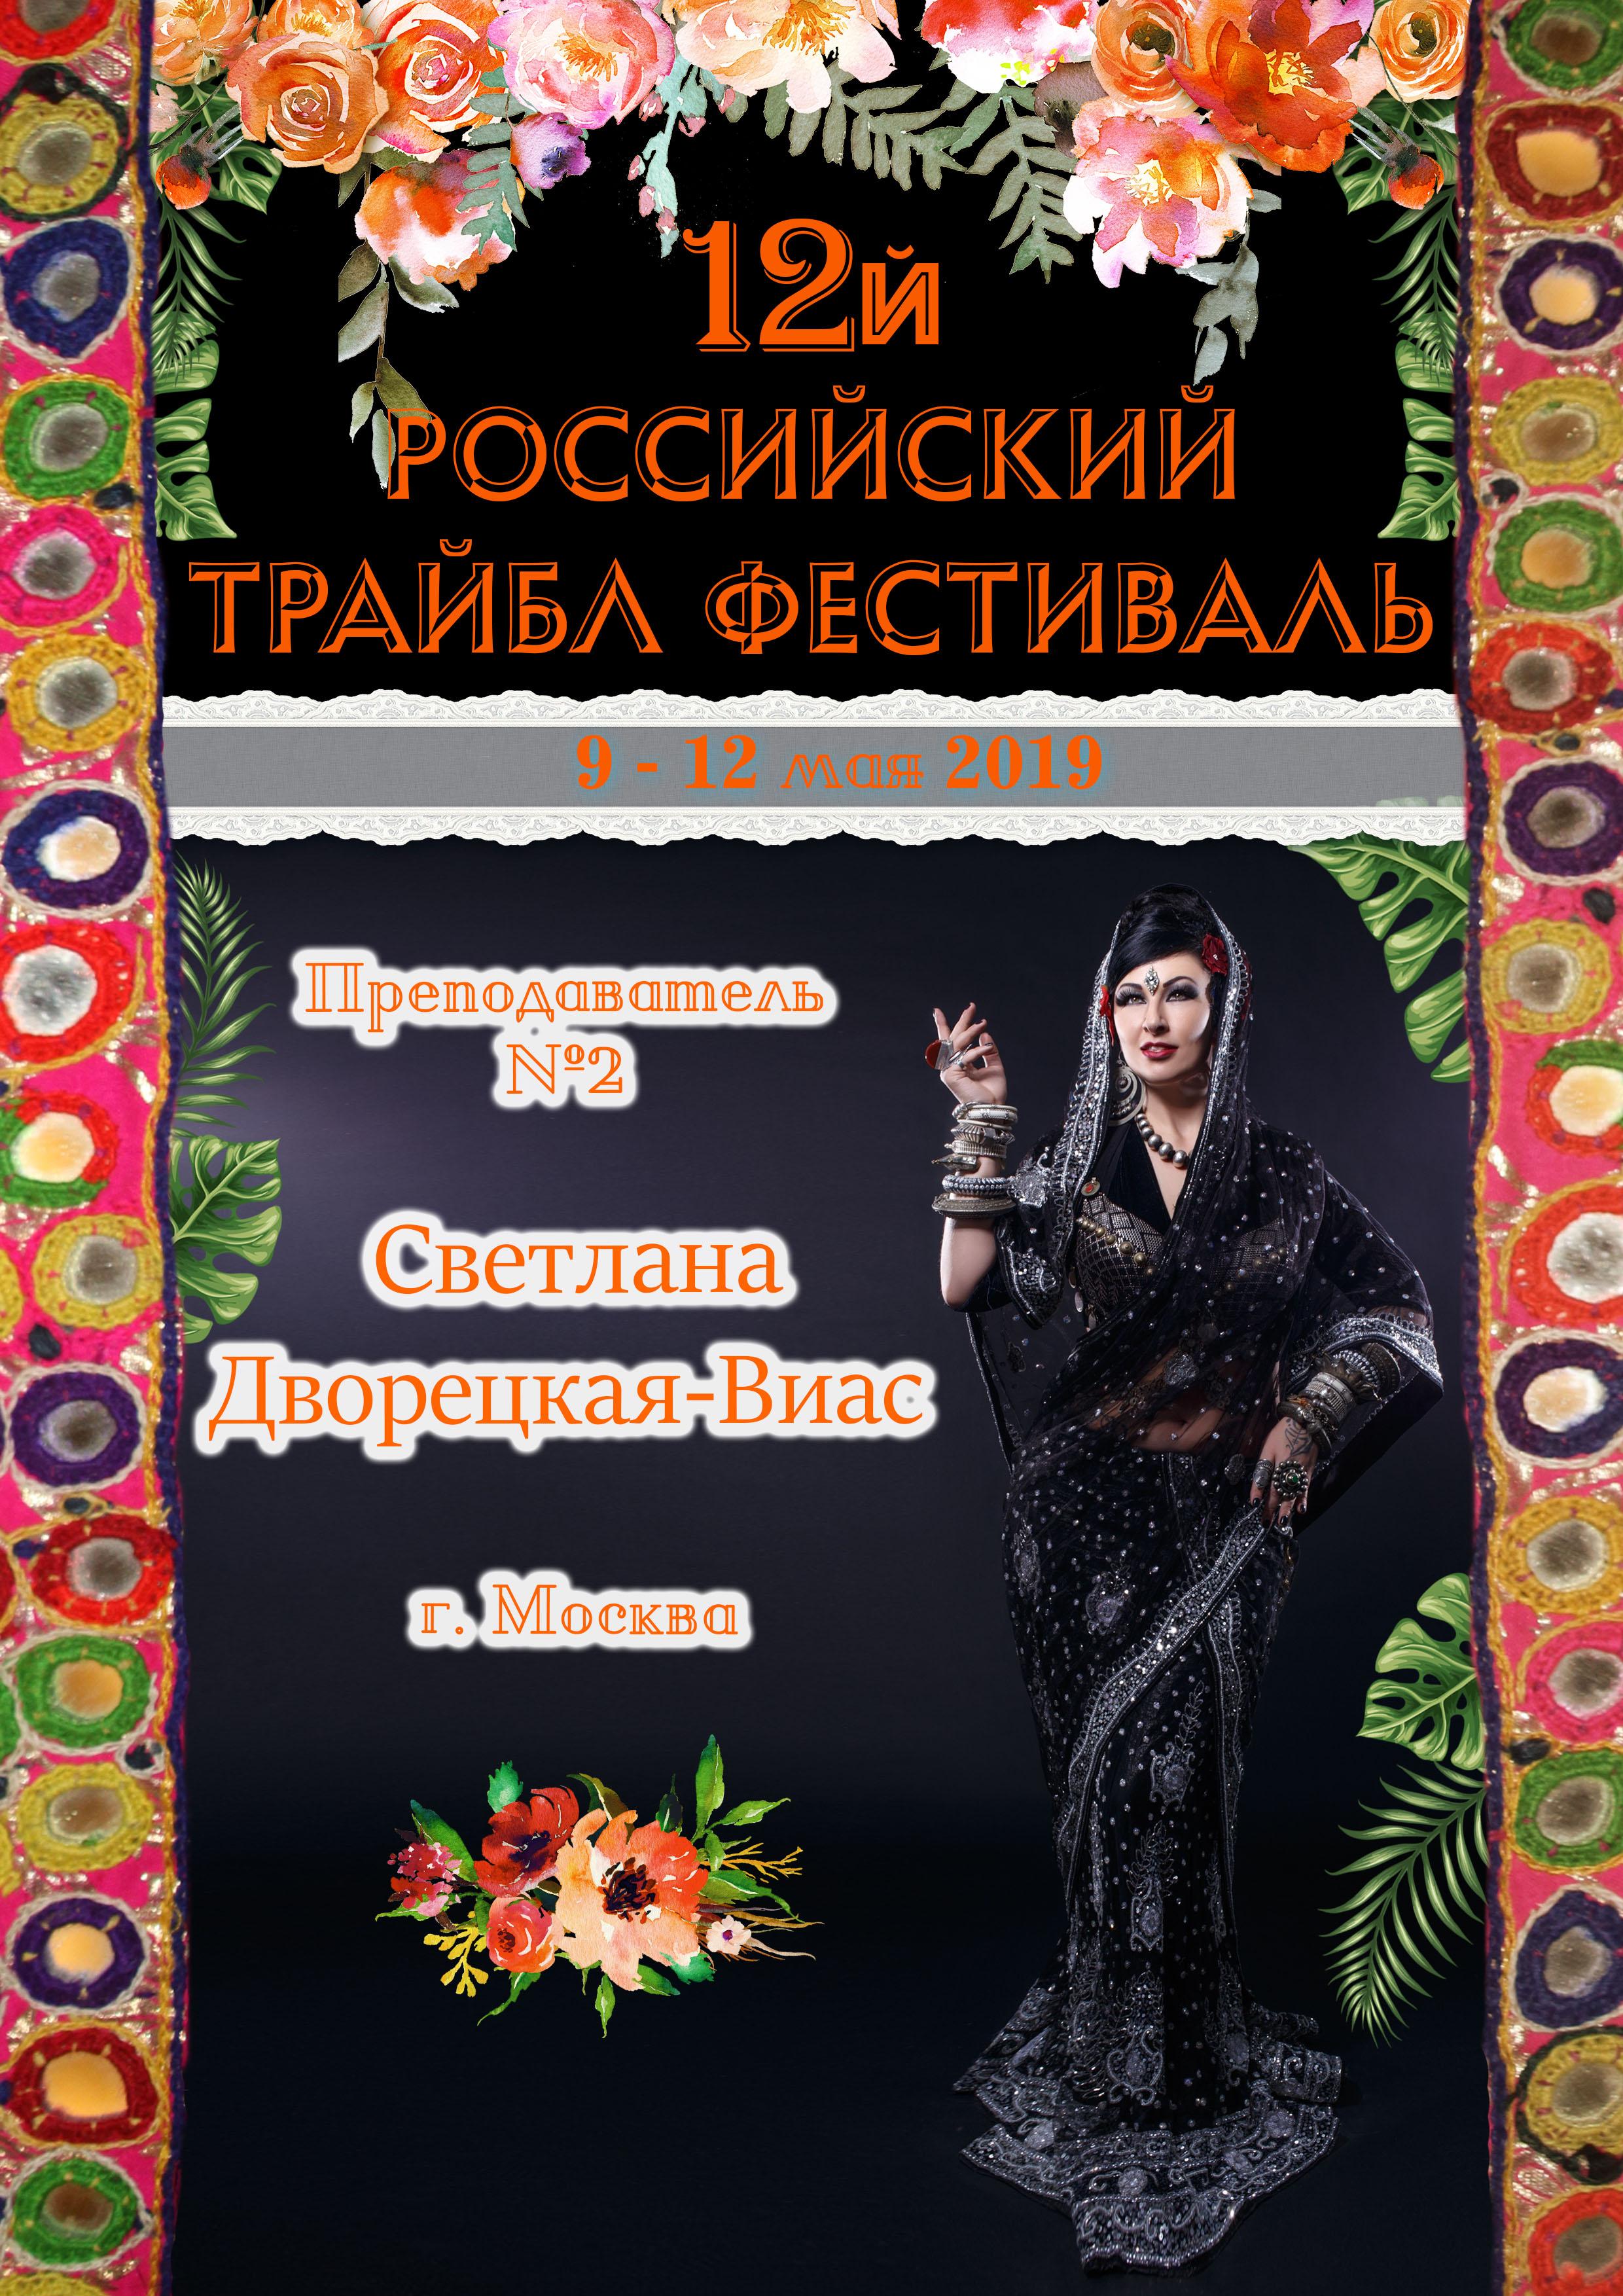 Светлана Дворецкая-Виас